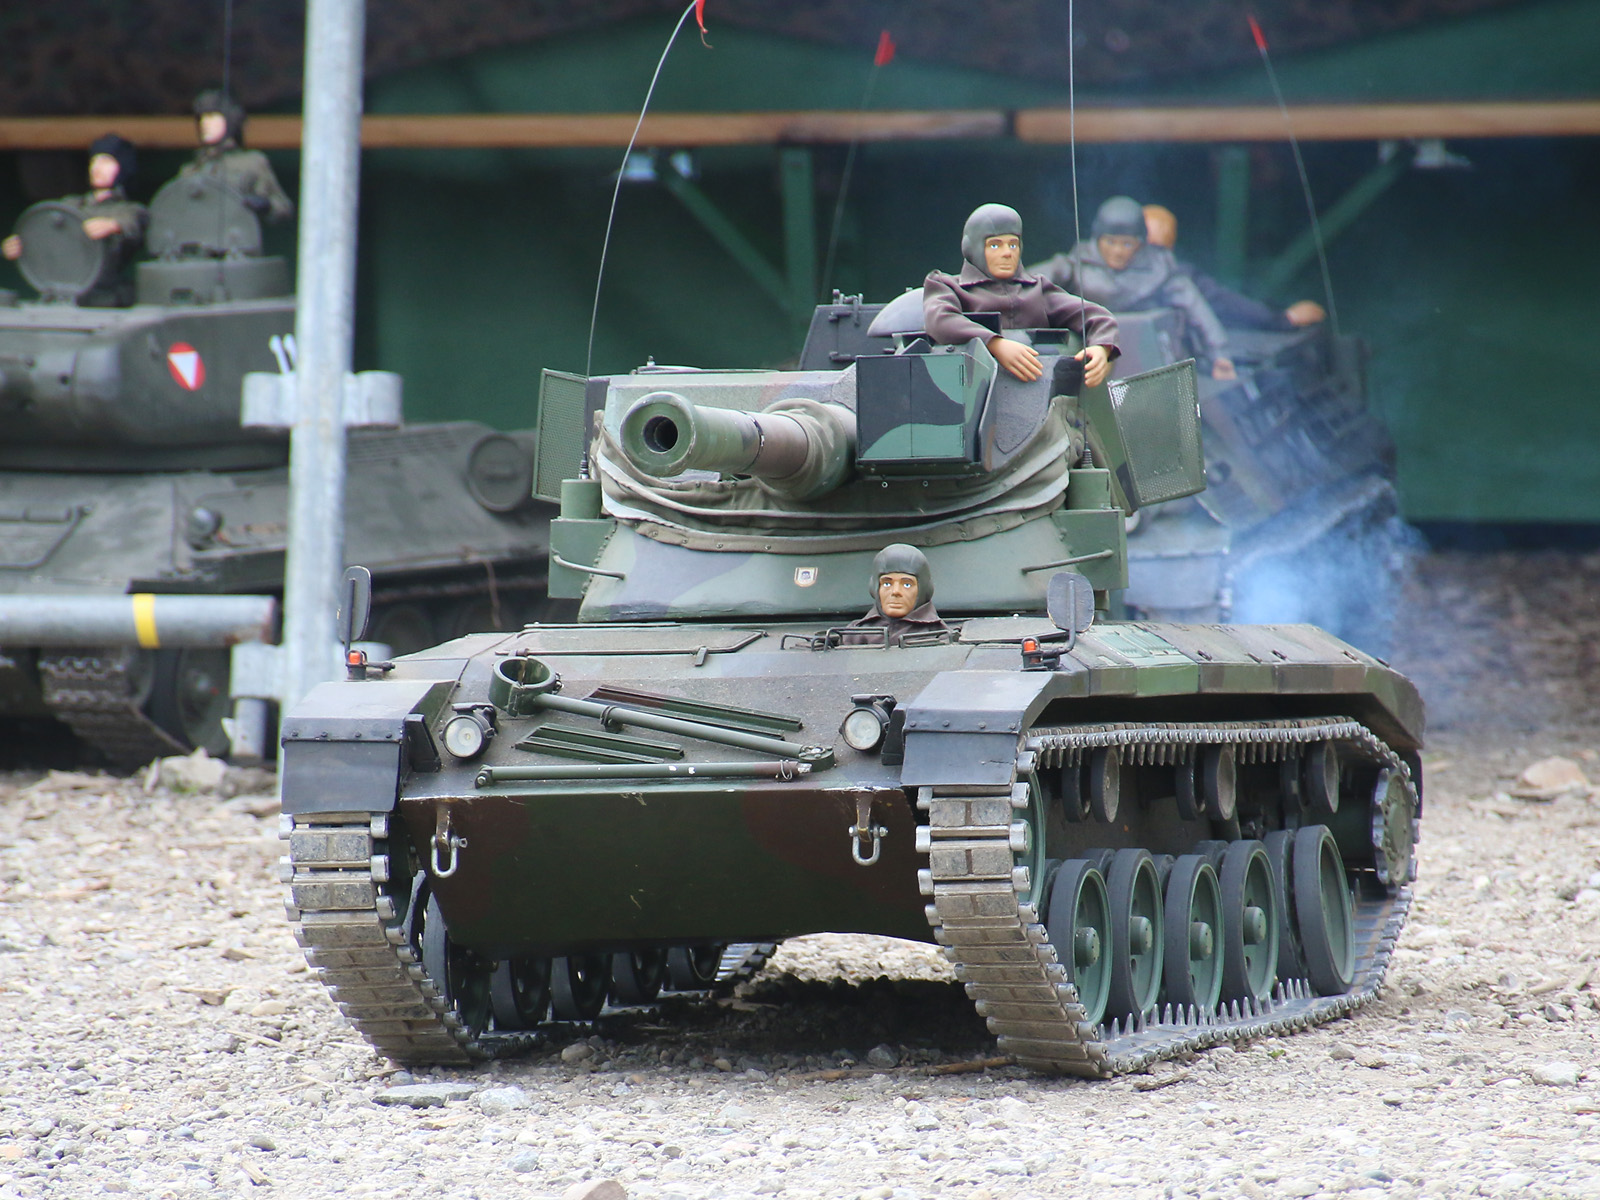 Ferngesteuerter Jagdpanzer Kürassier A1 mit Benzinmotor © Doppeladler.com